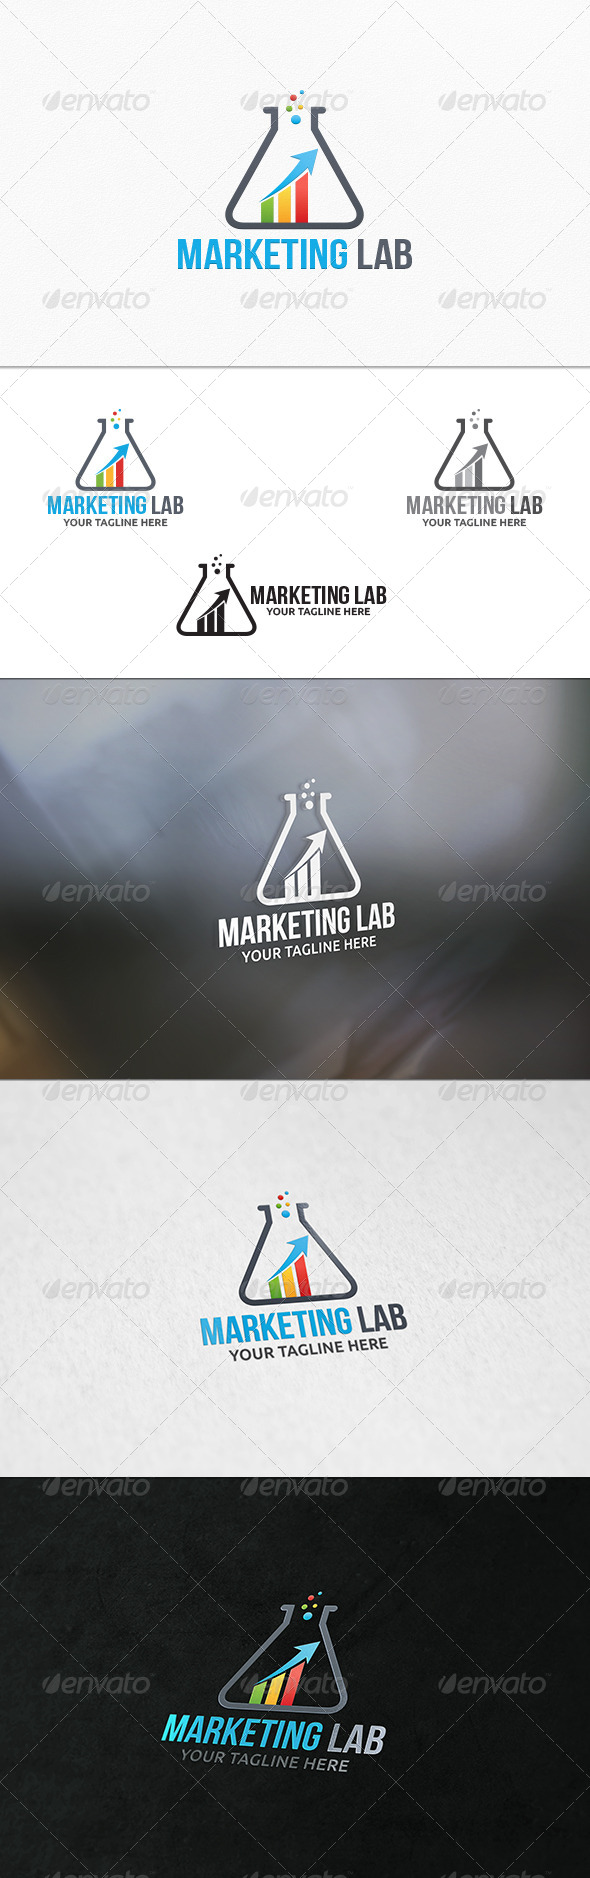 Marketing Lab Logo Template